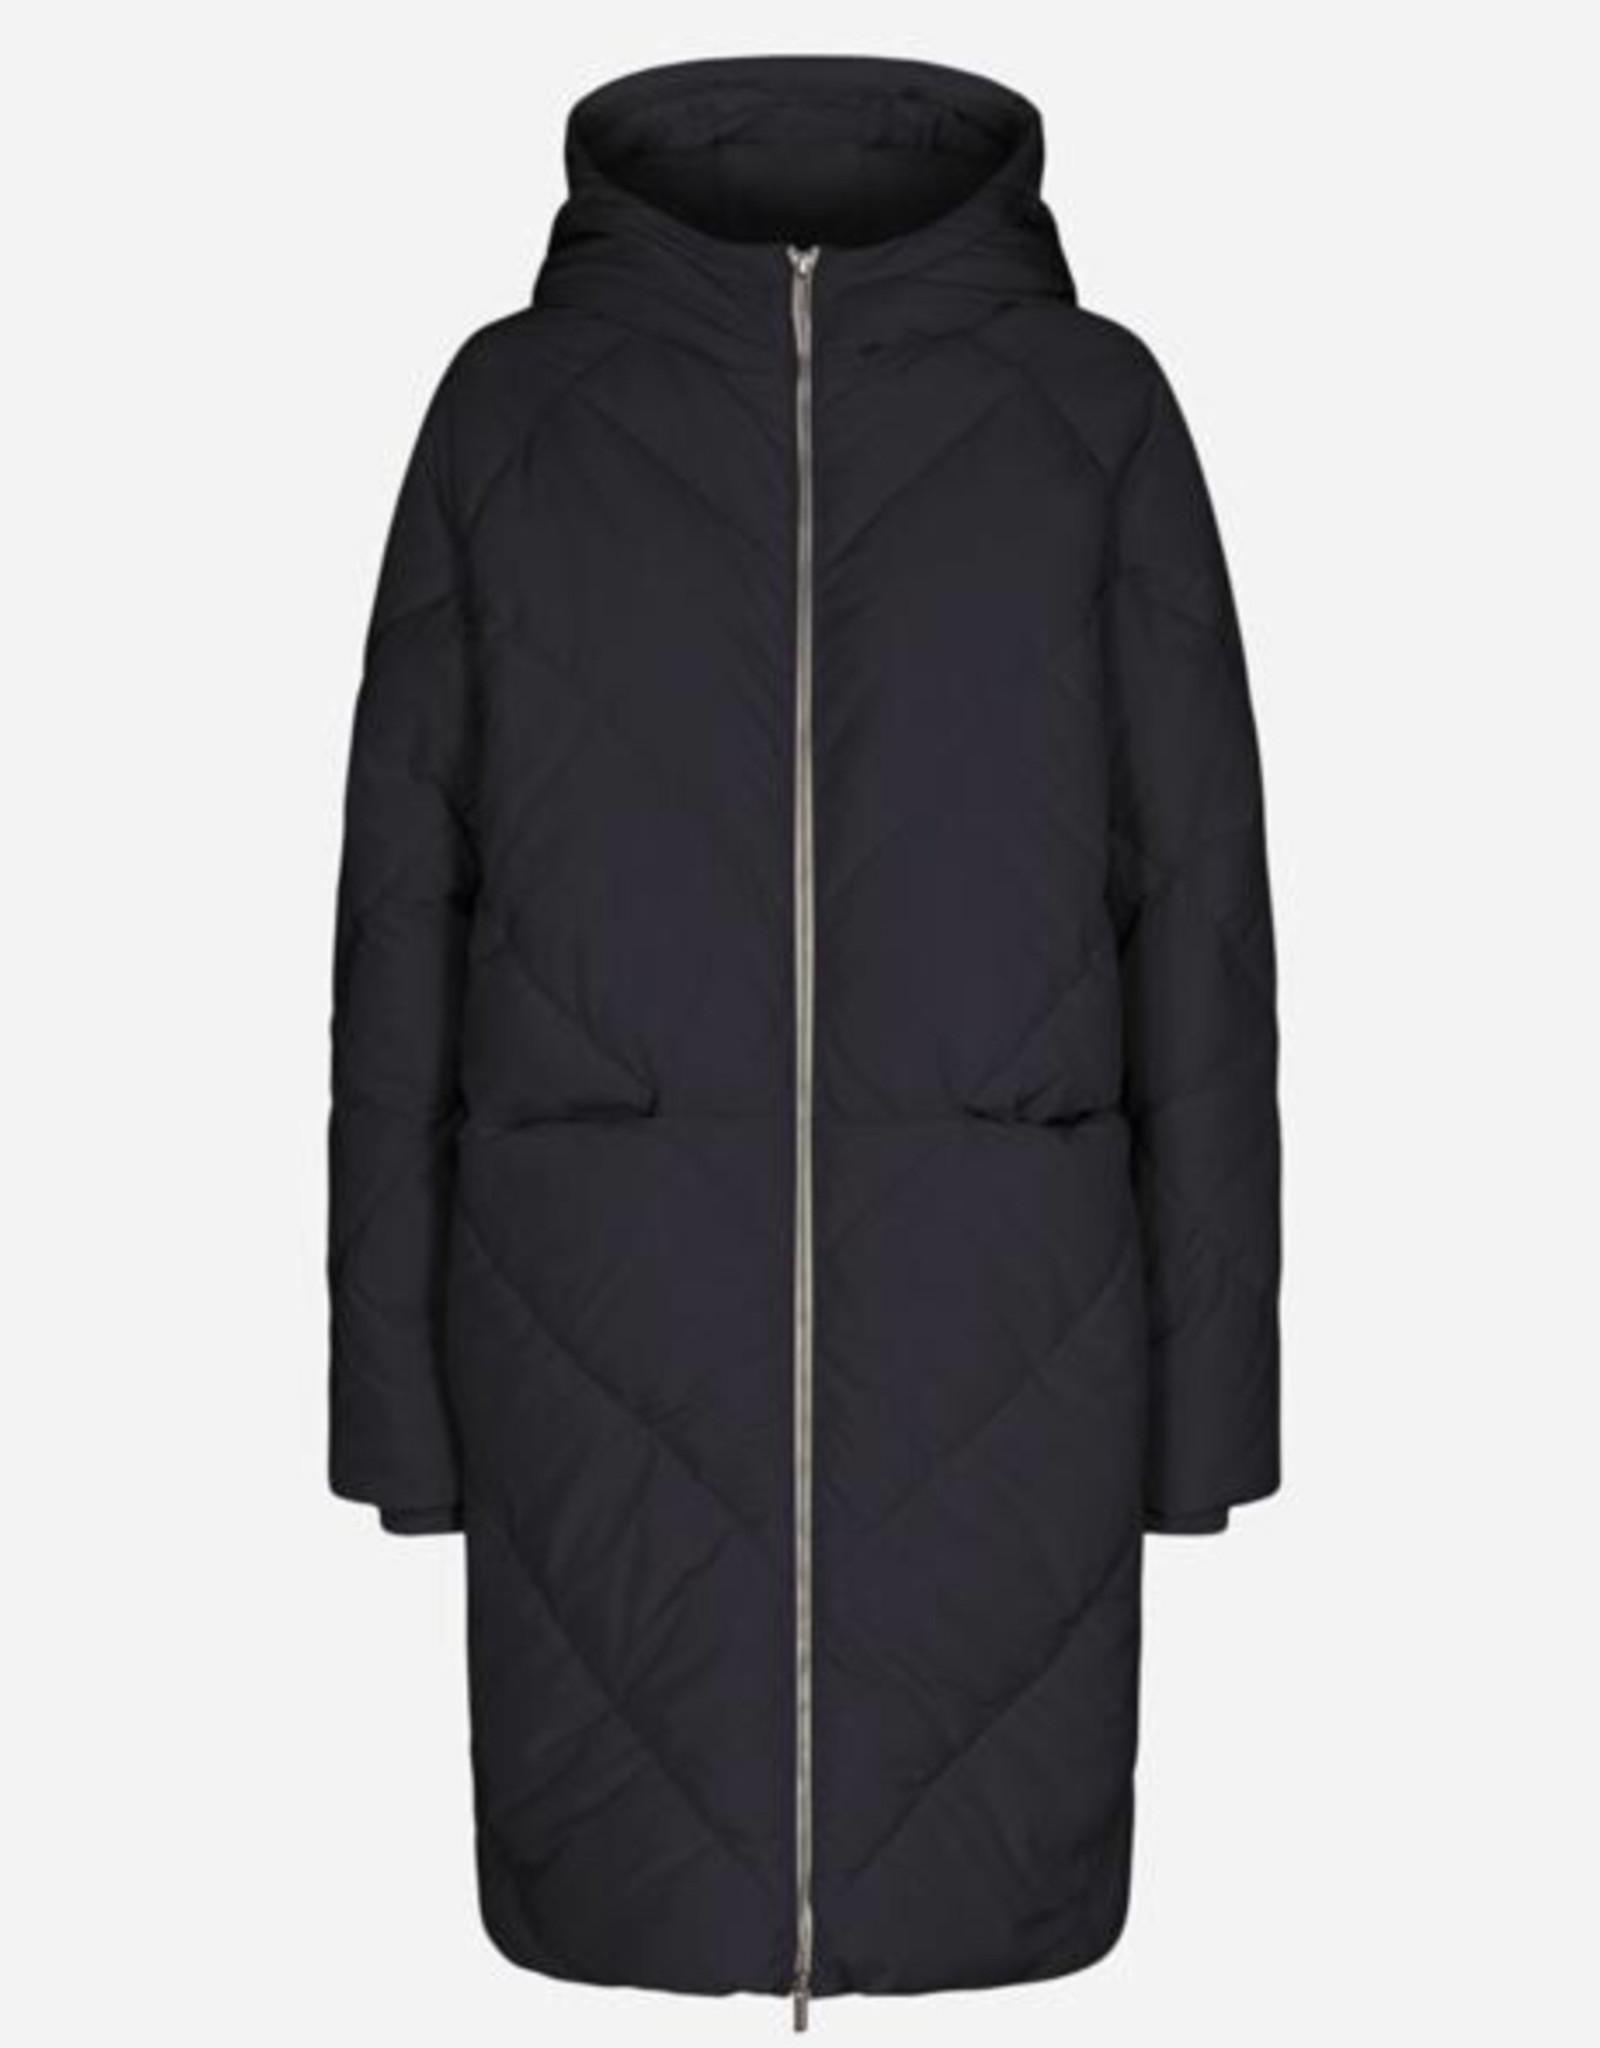 Soya Concept Soya Concept Nina 12 Long Puffer Jacket with a Hood